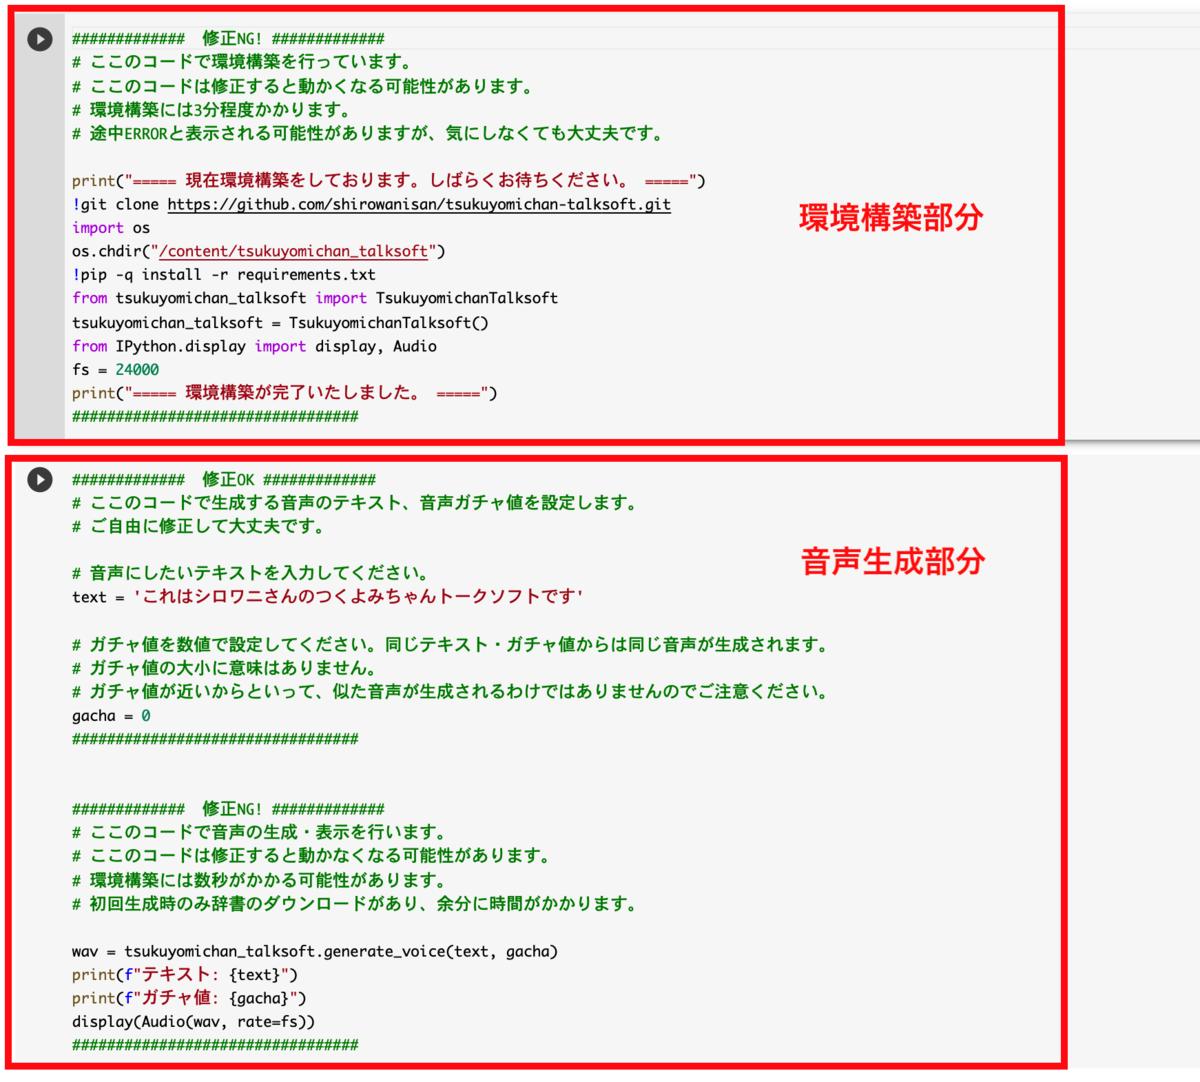 f:id:shirowanisan:20210512015357p:plain